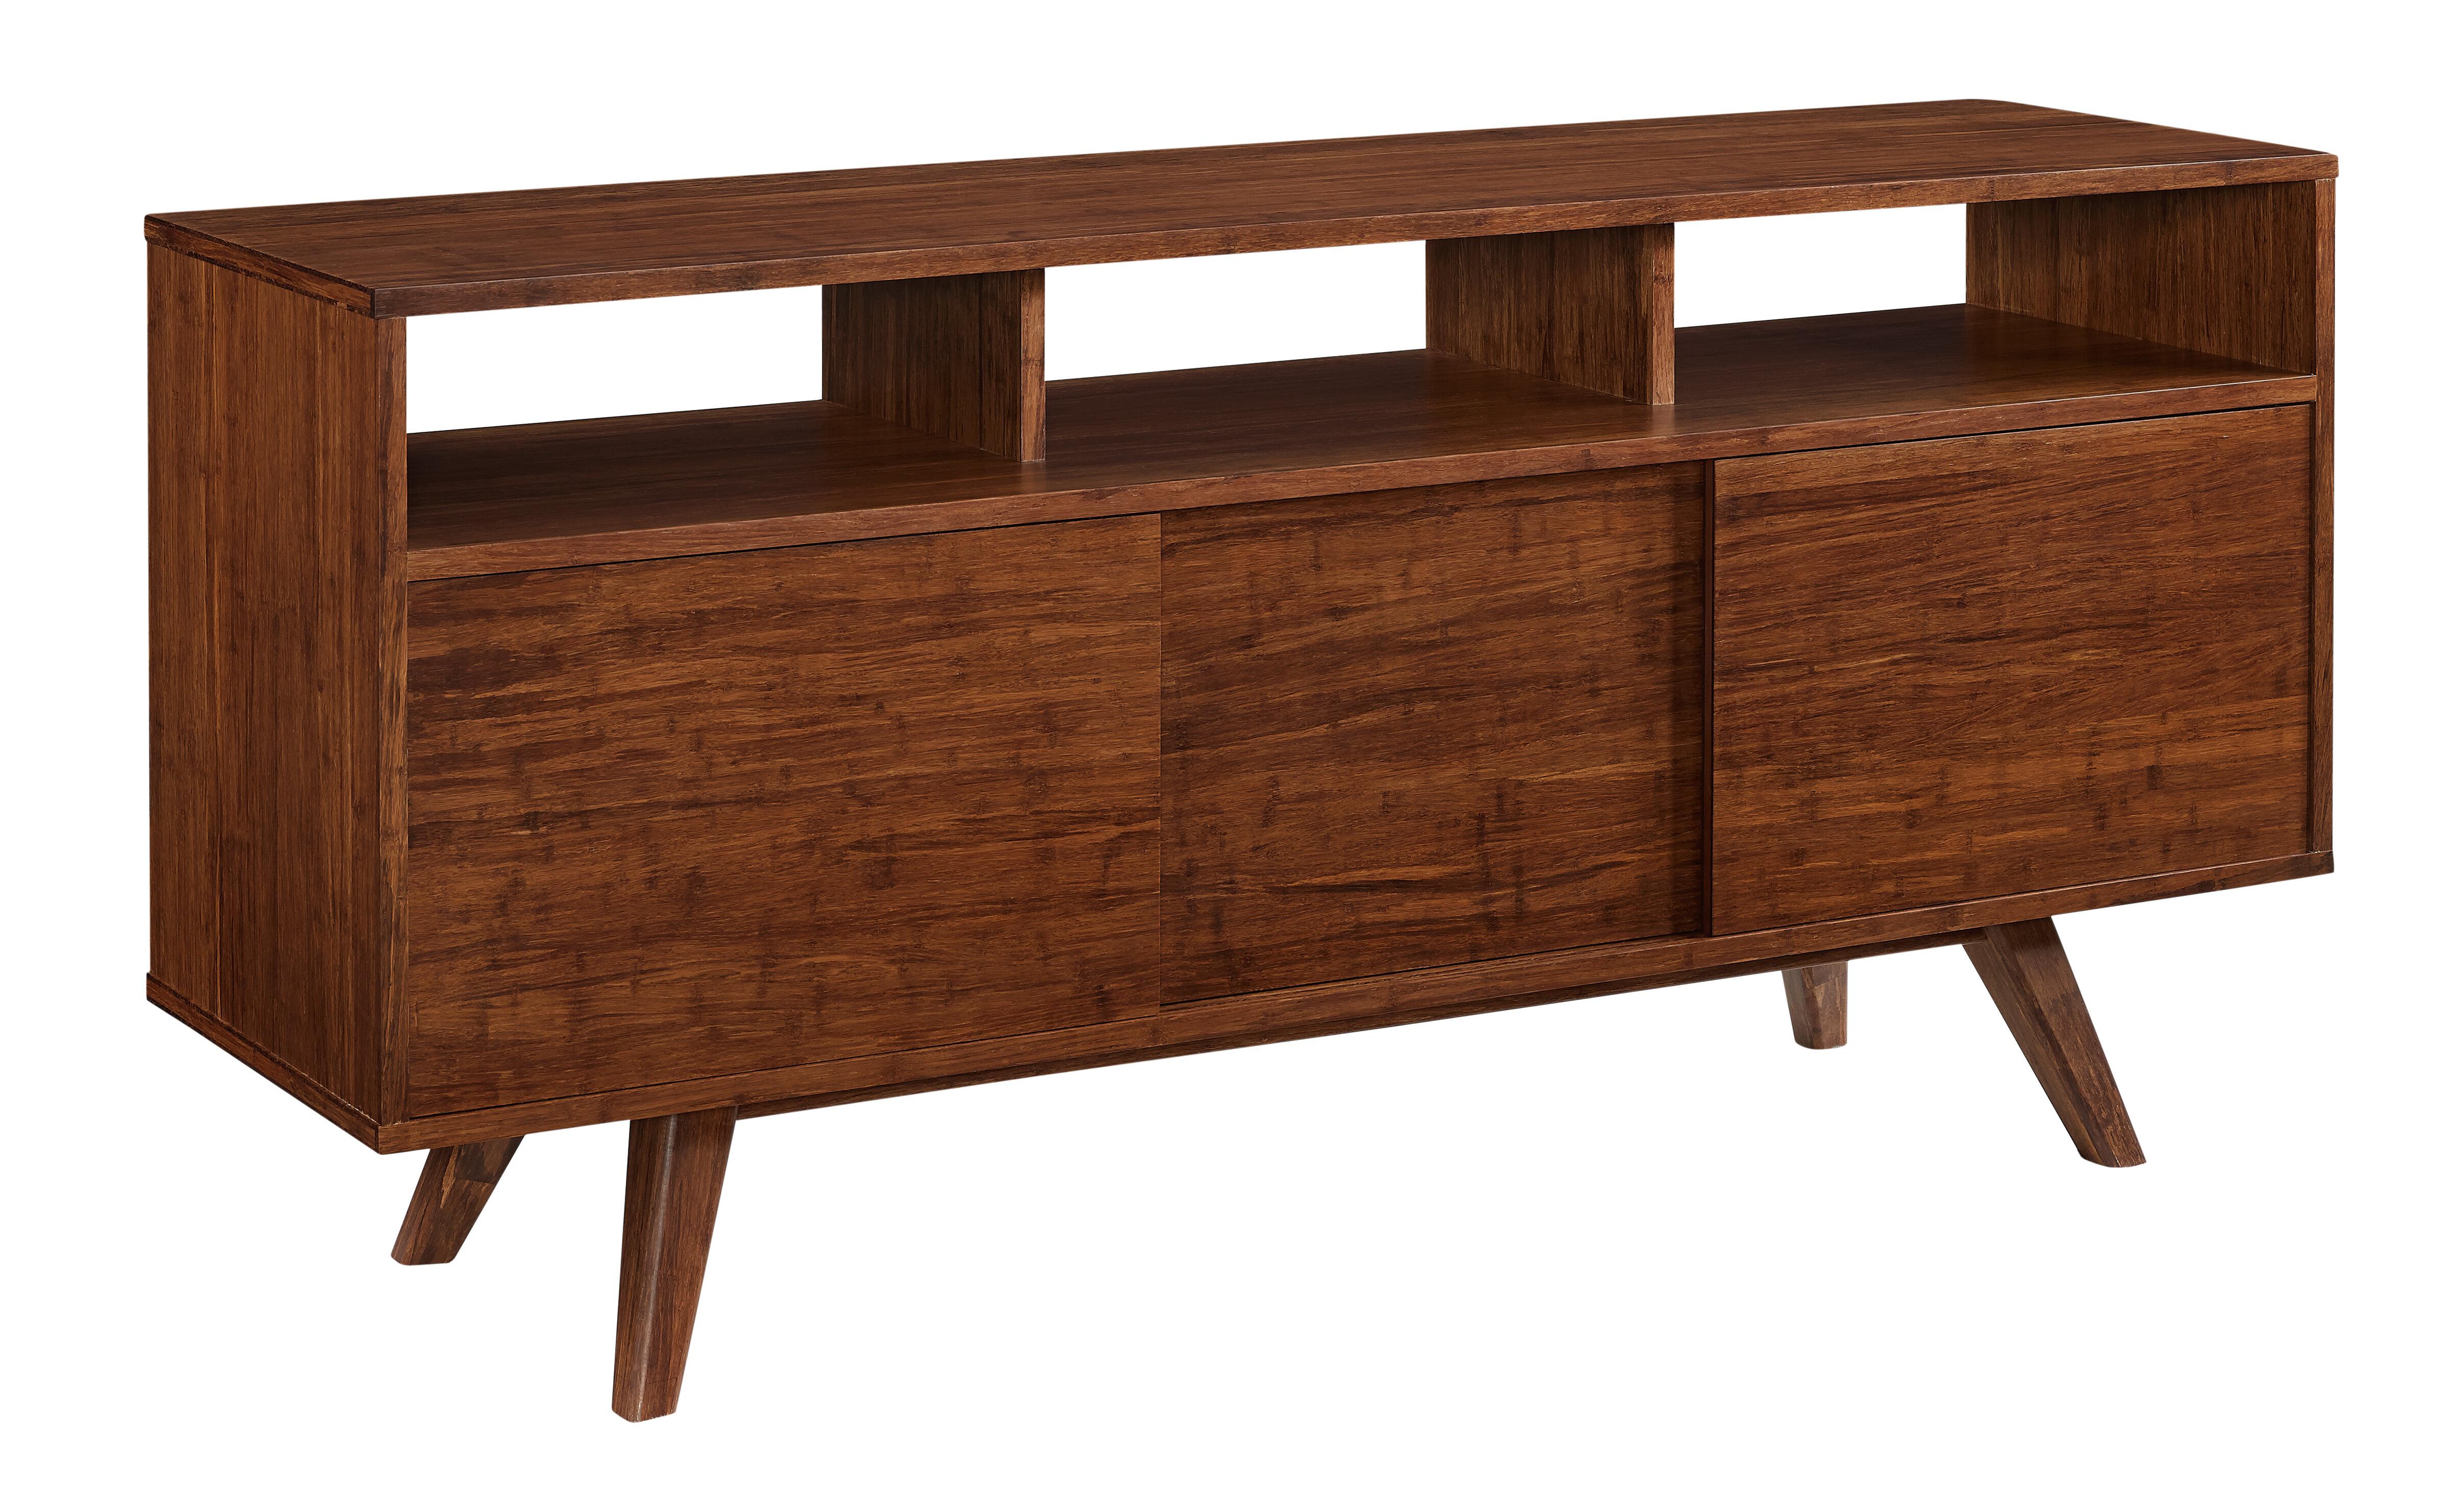 shelves prod entertainment dresser storage tv center itm stand television drawers